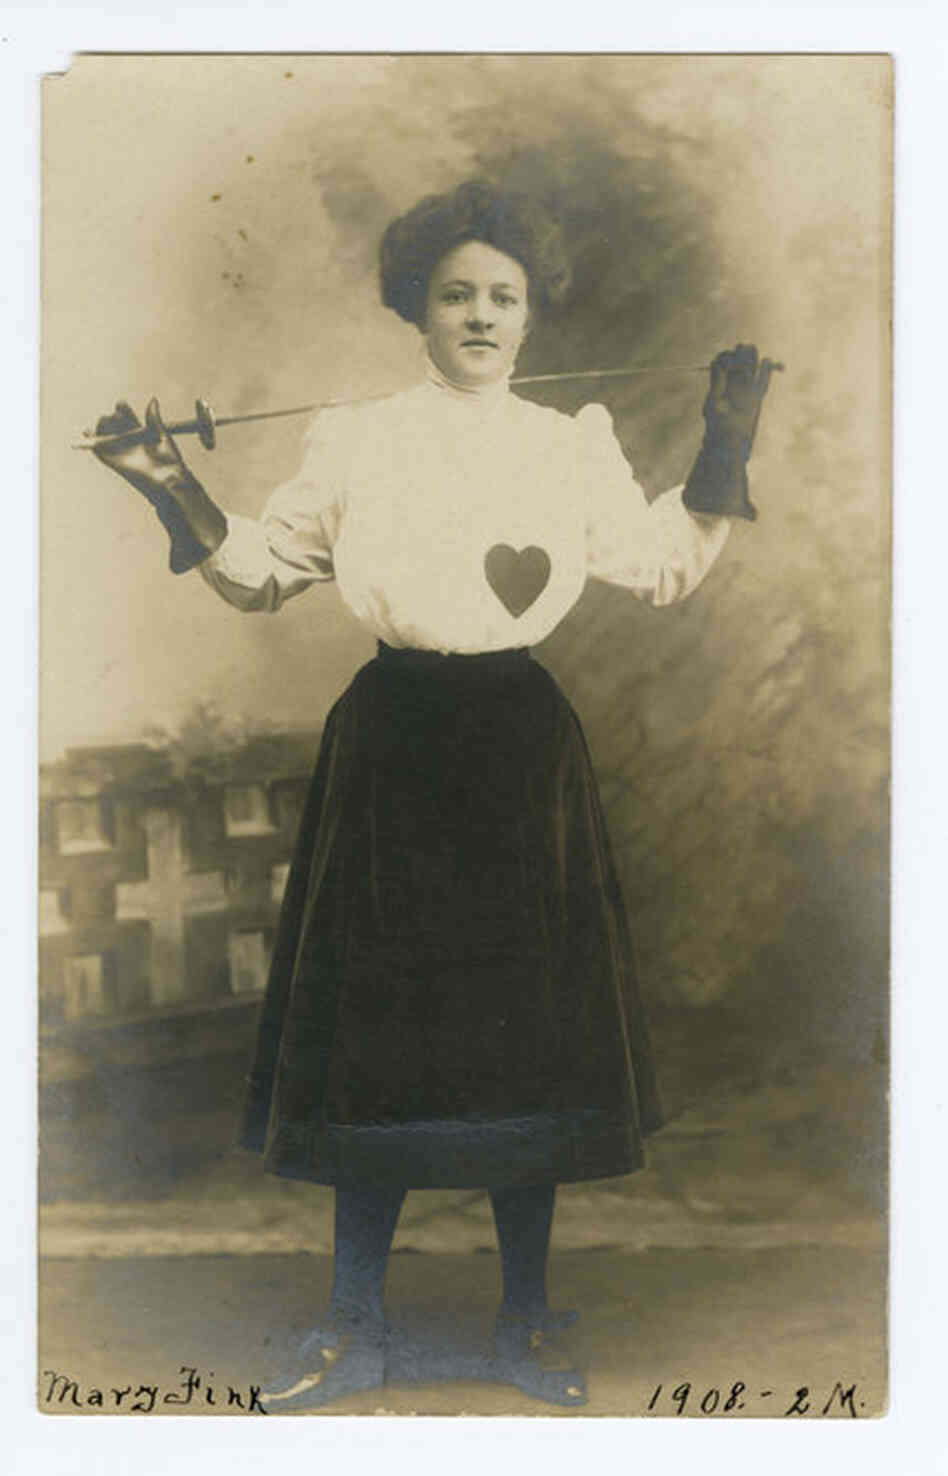 """Mary Fink, May 2, 1908."" Female fencer, photographer C.E. Kerfoot, Washington, D.C."